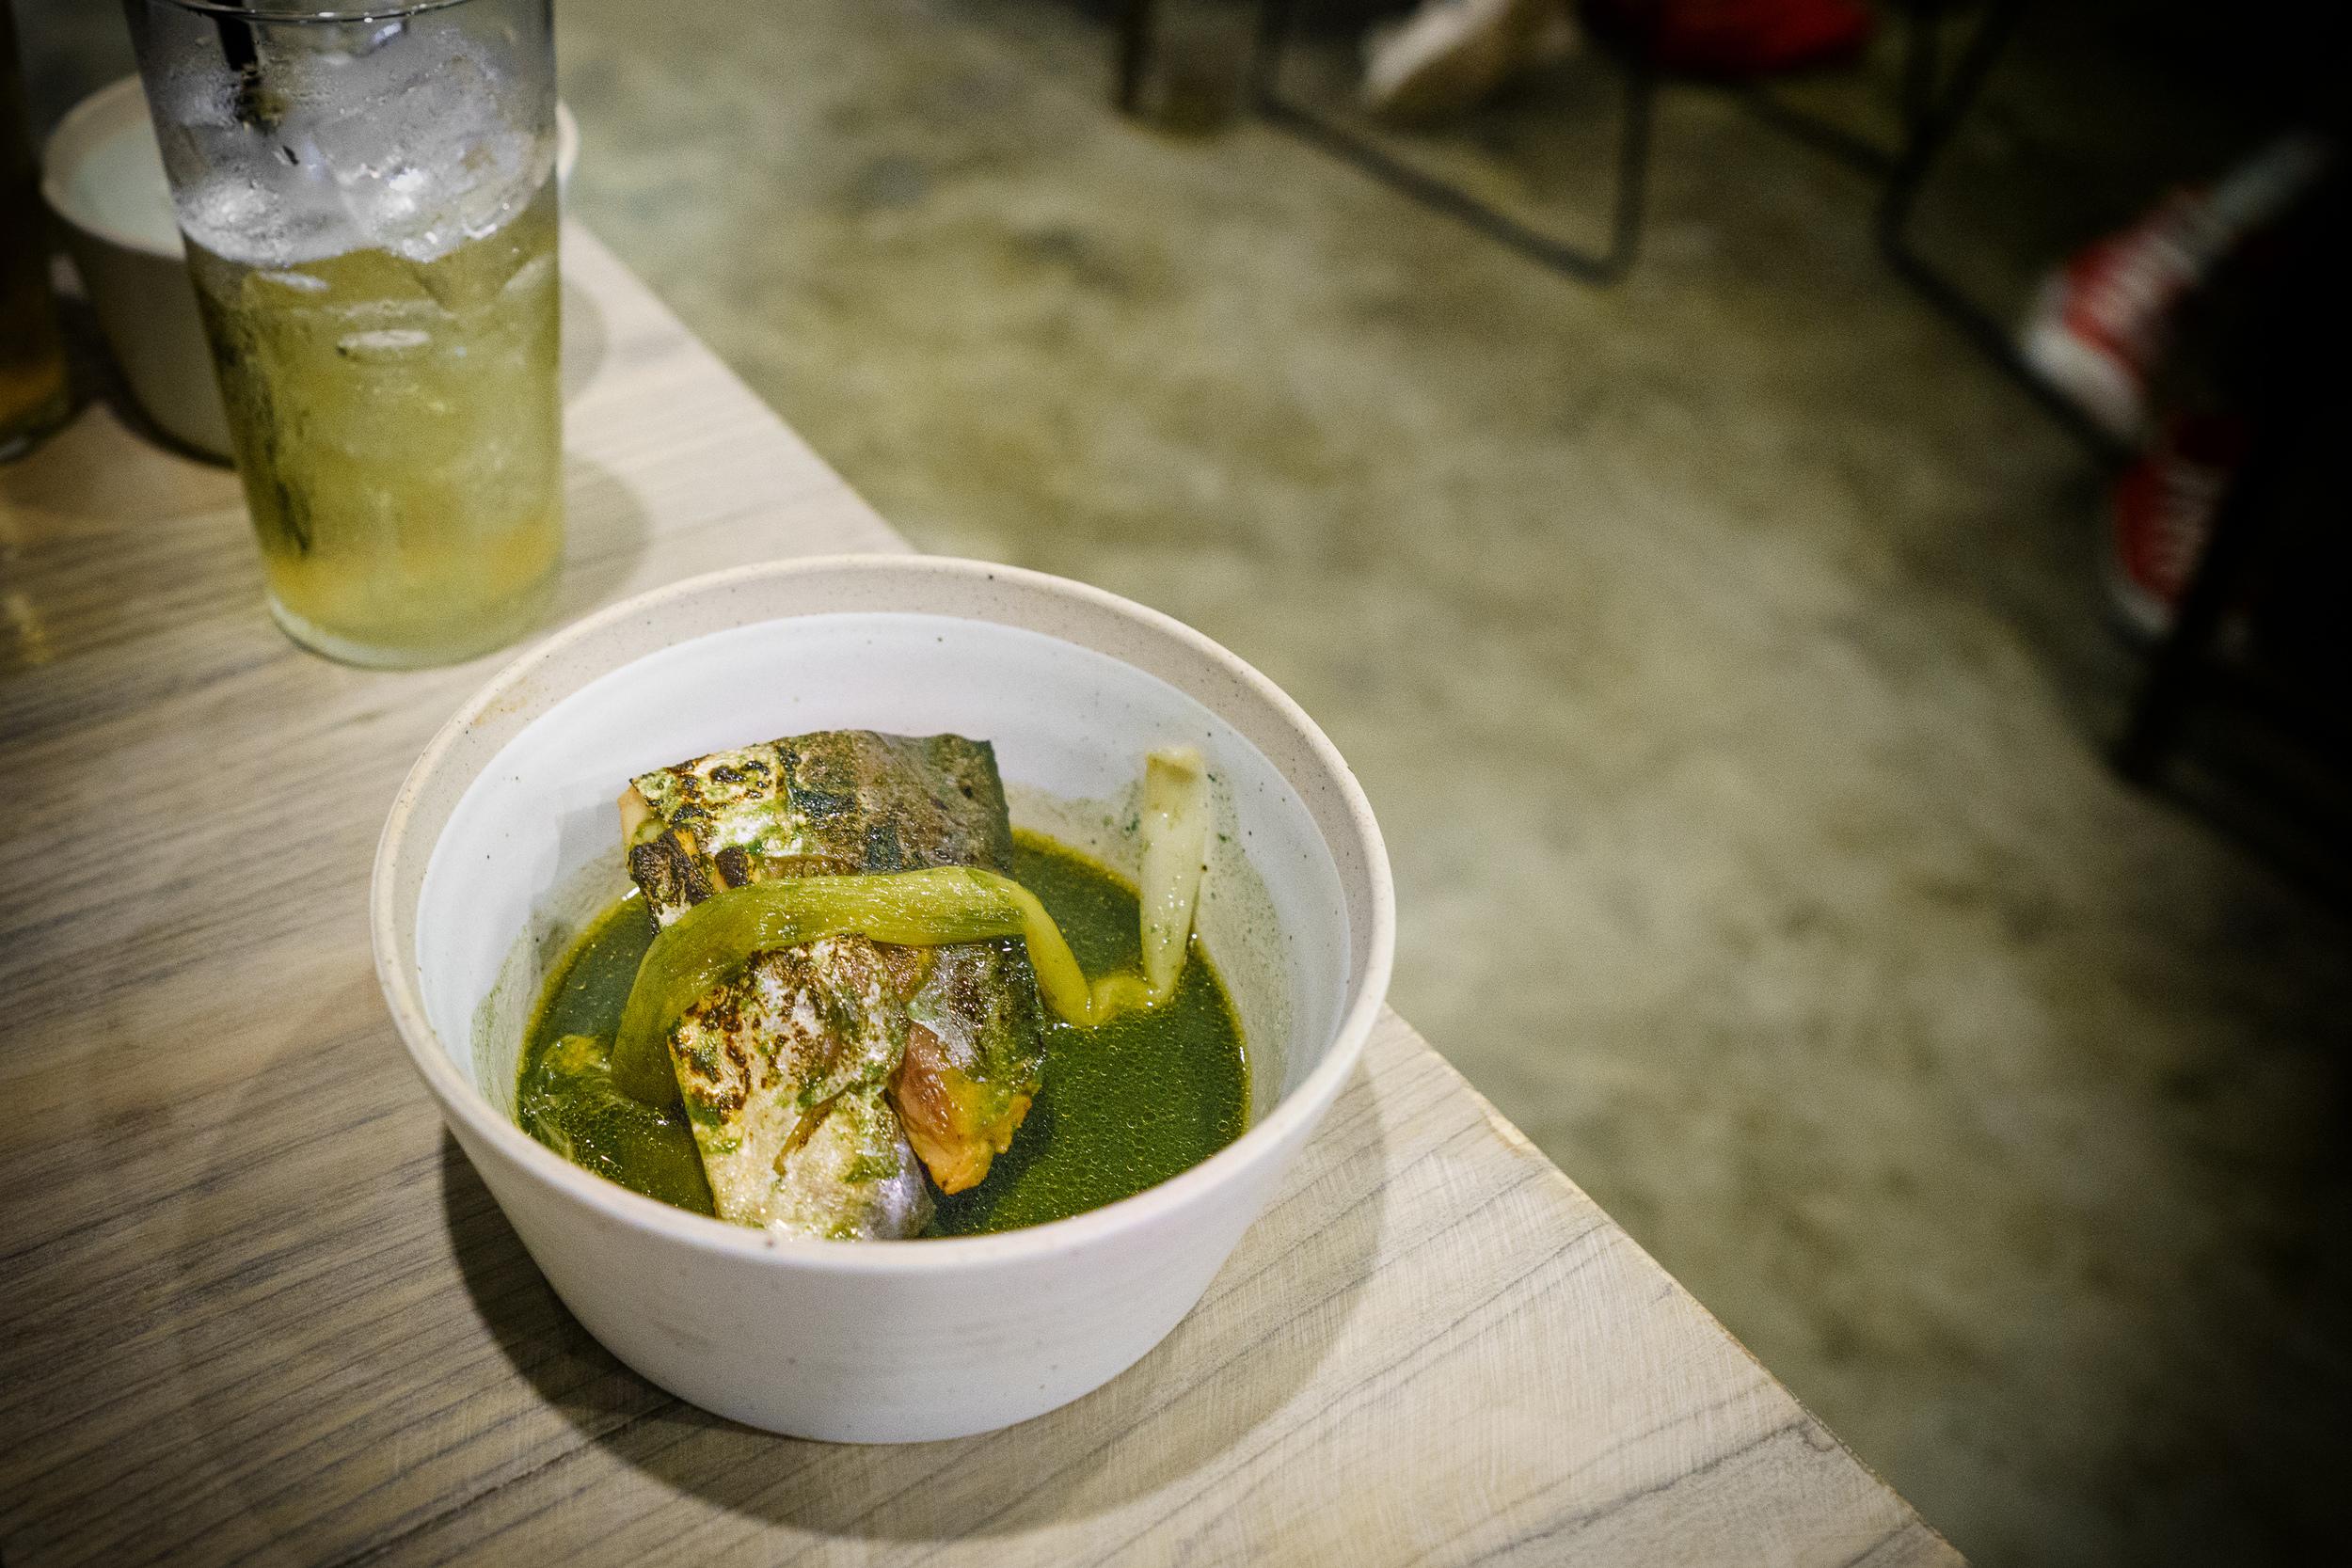 Mackerel, green chili, spinach, scallion